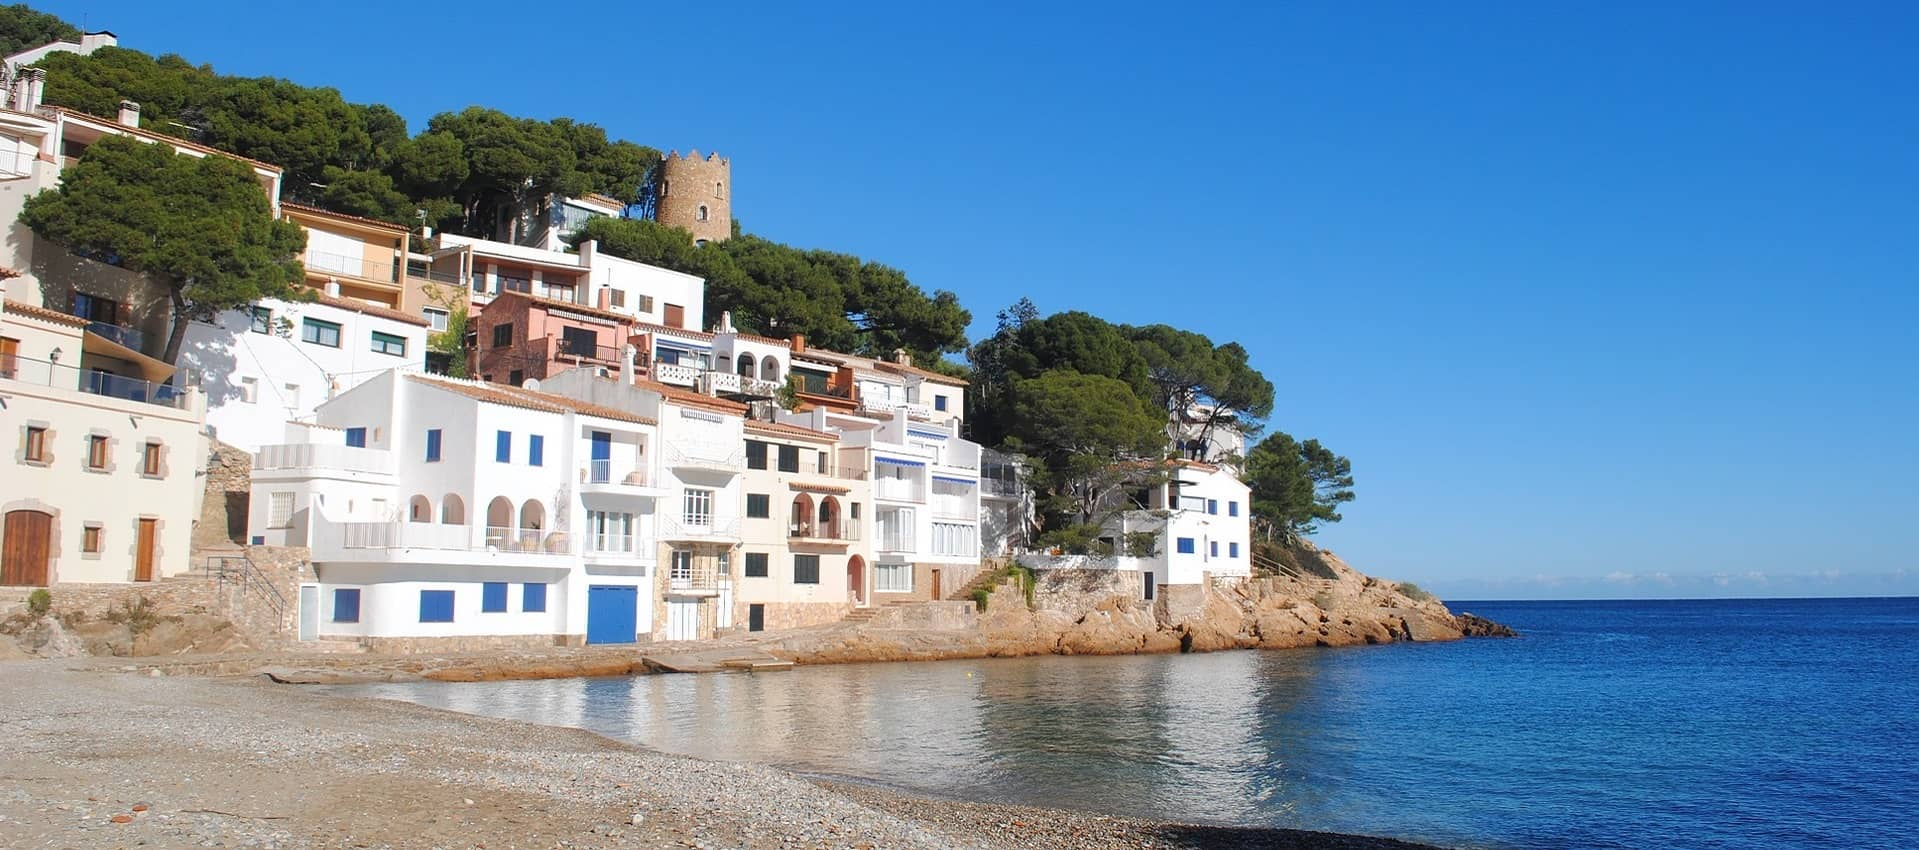 Girona & Costa Brava Cycling Holiday